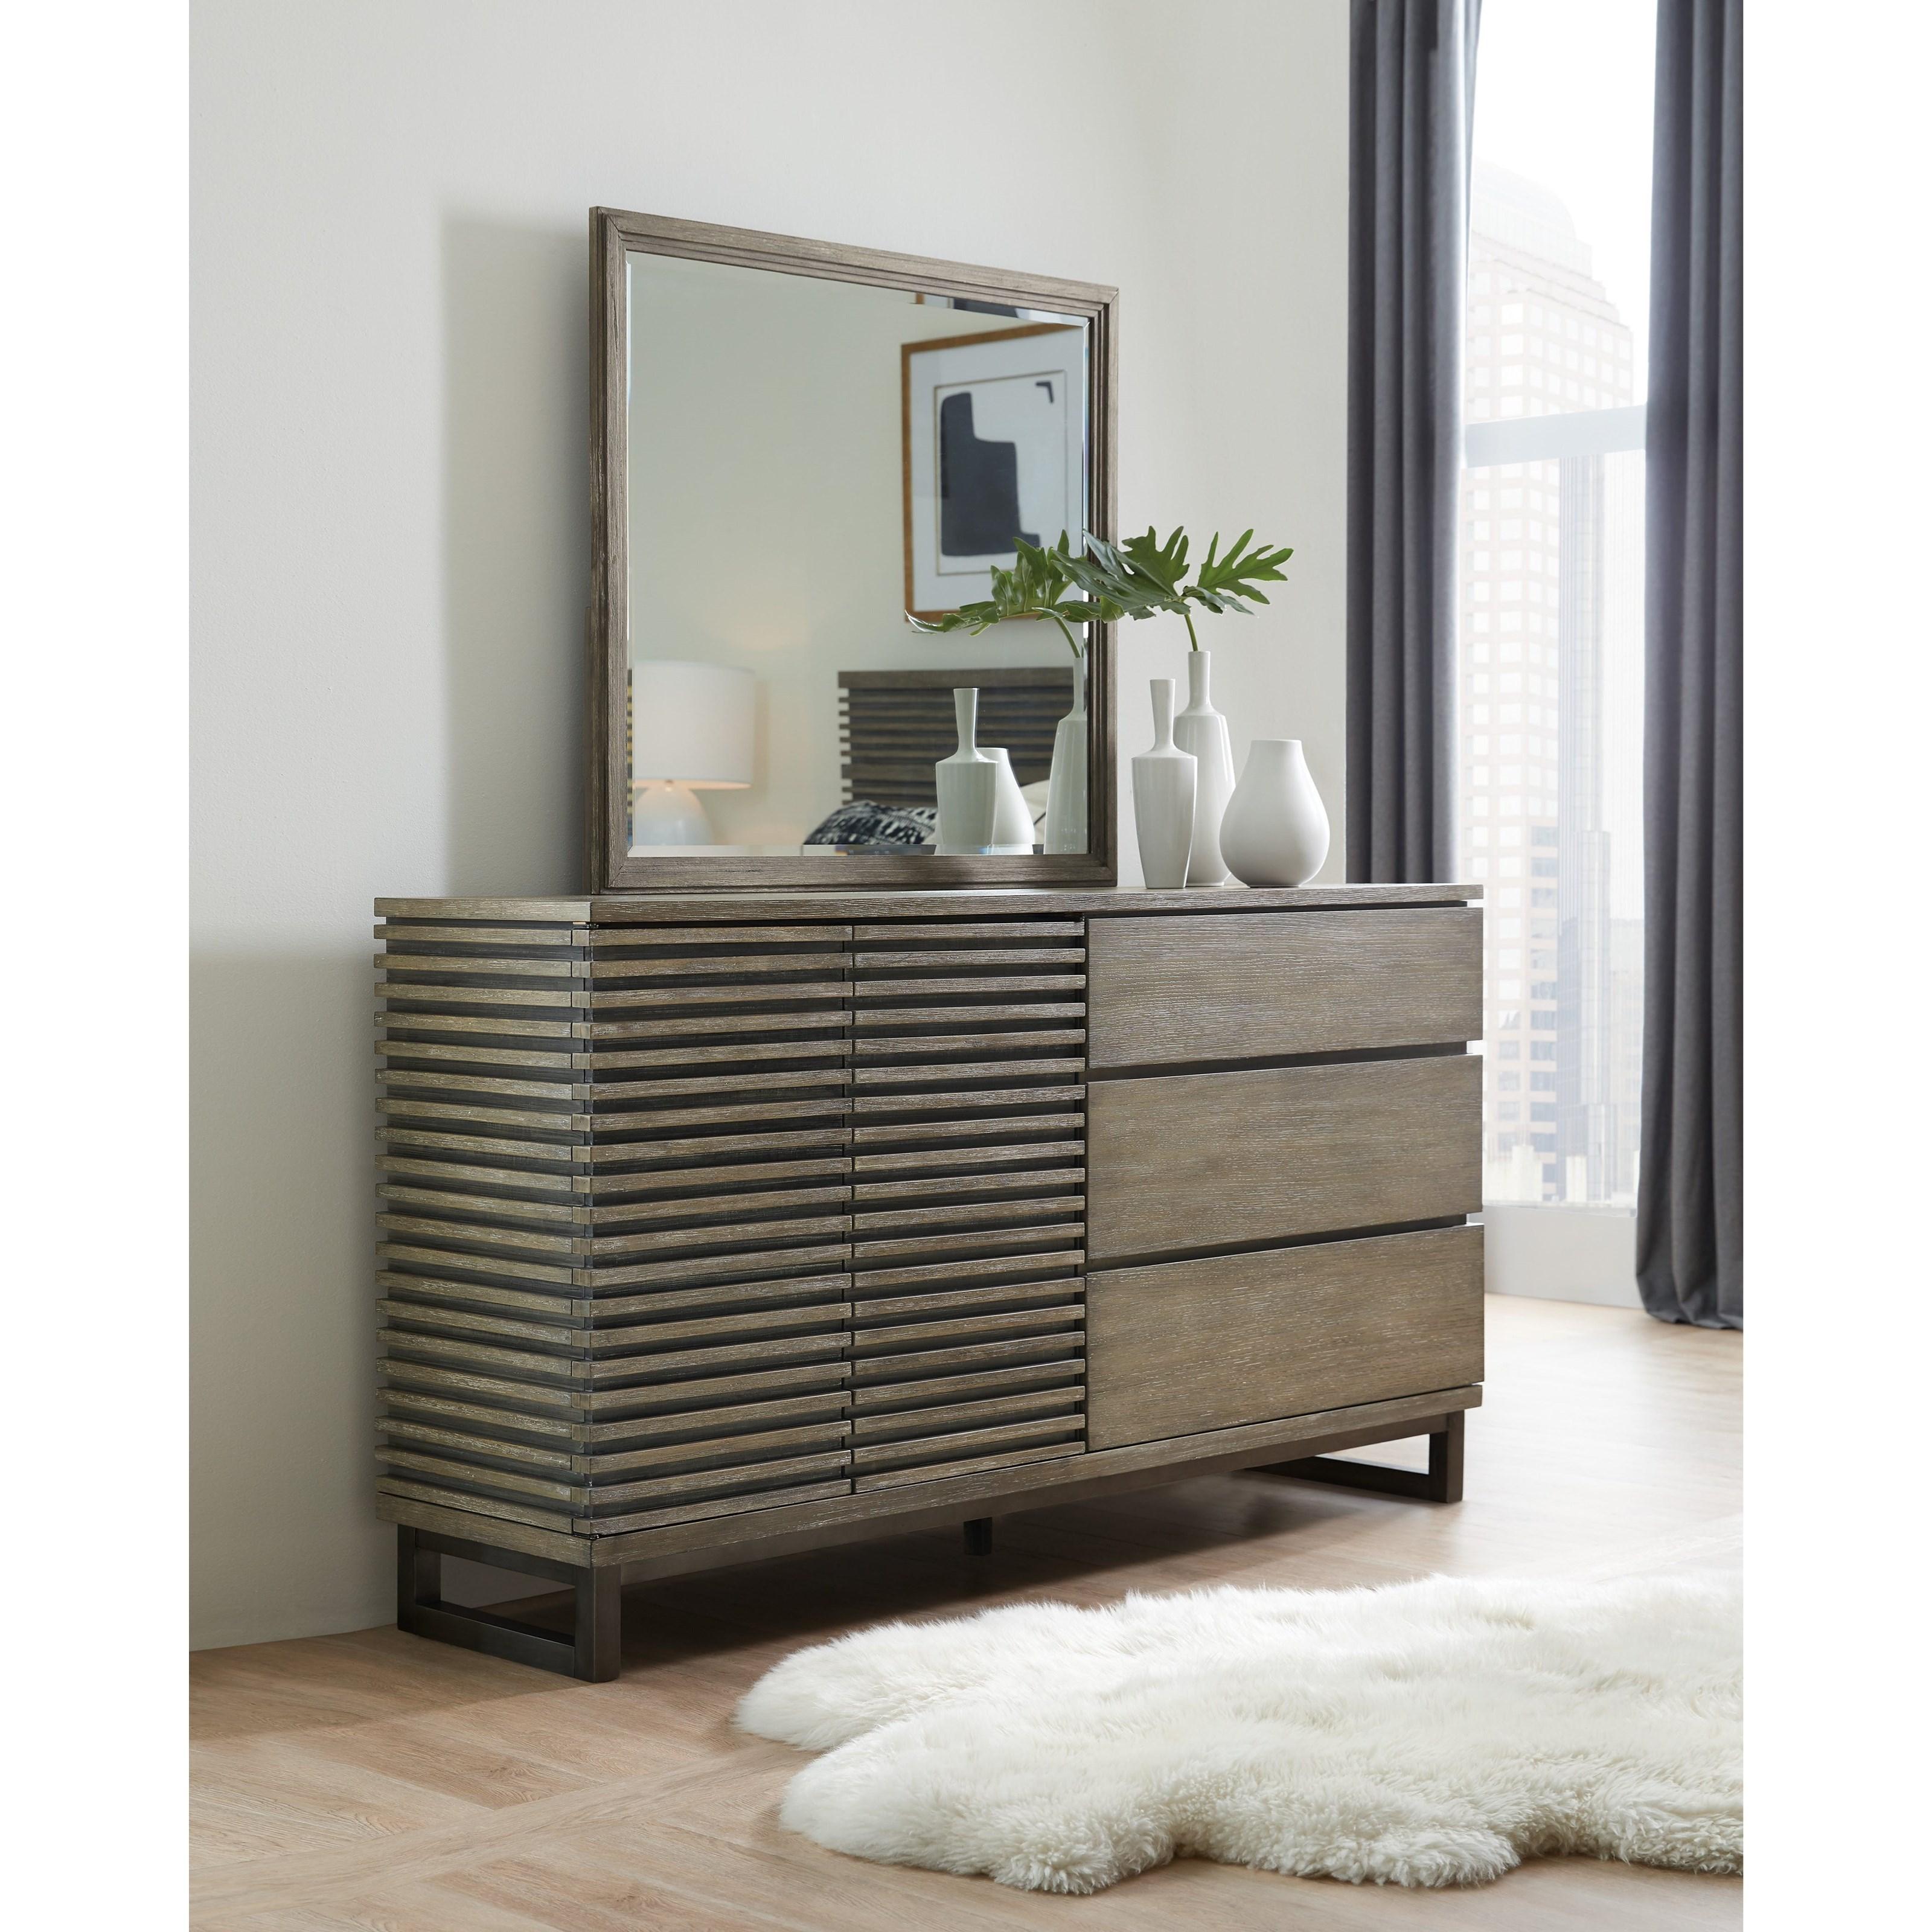 Annex Contemporary Dresser And Mirror Set By Hooker Furniture